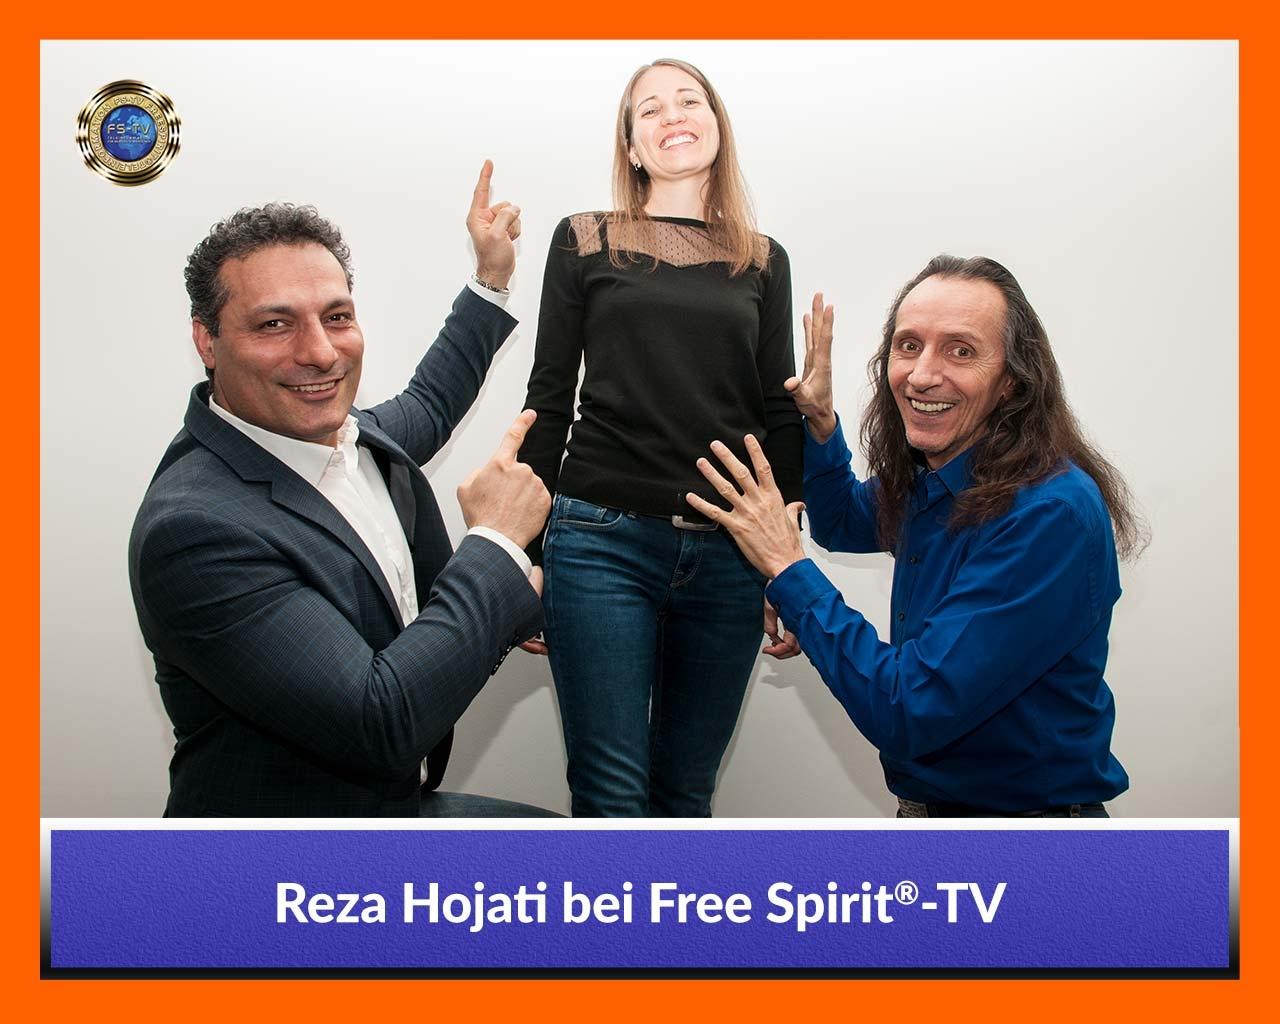 Reza-Hojati-02